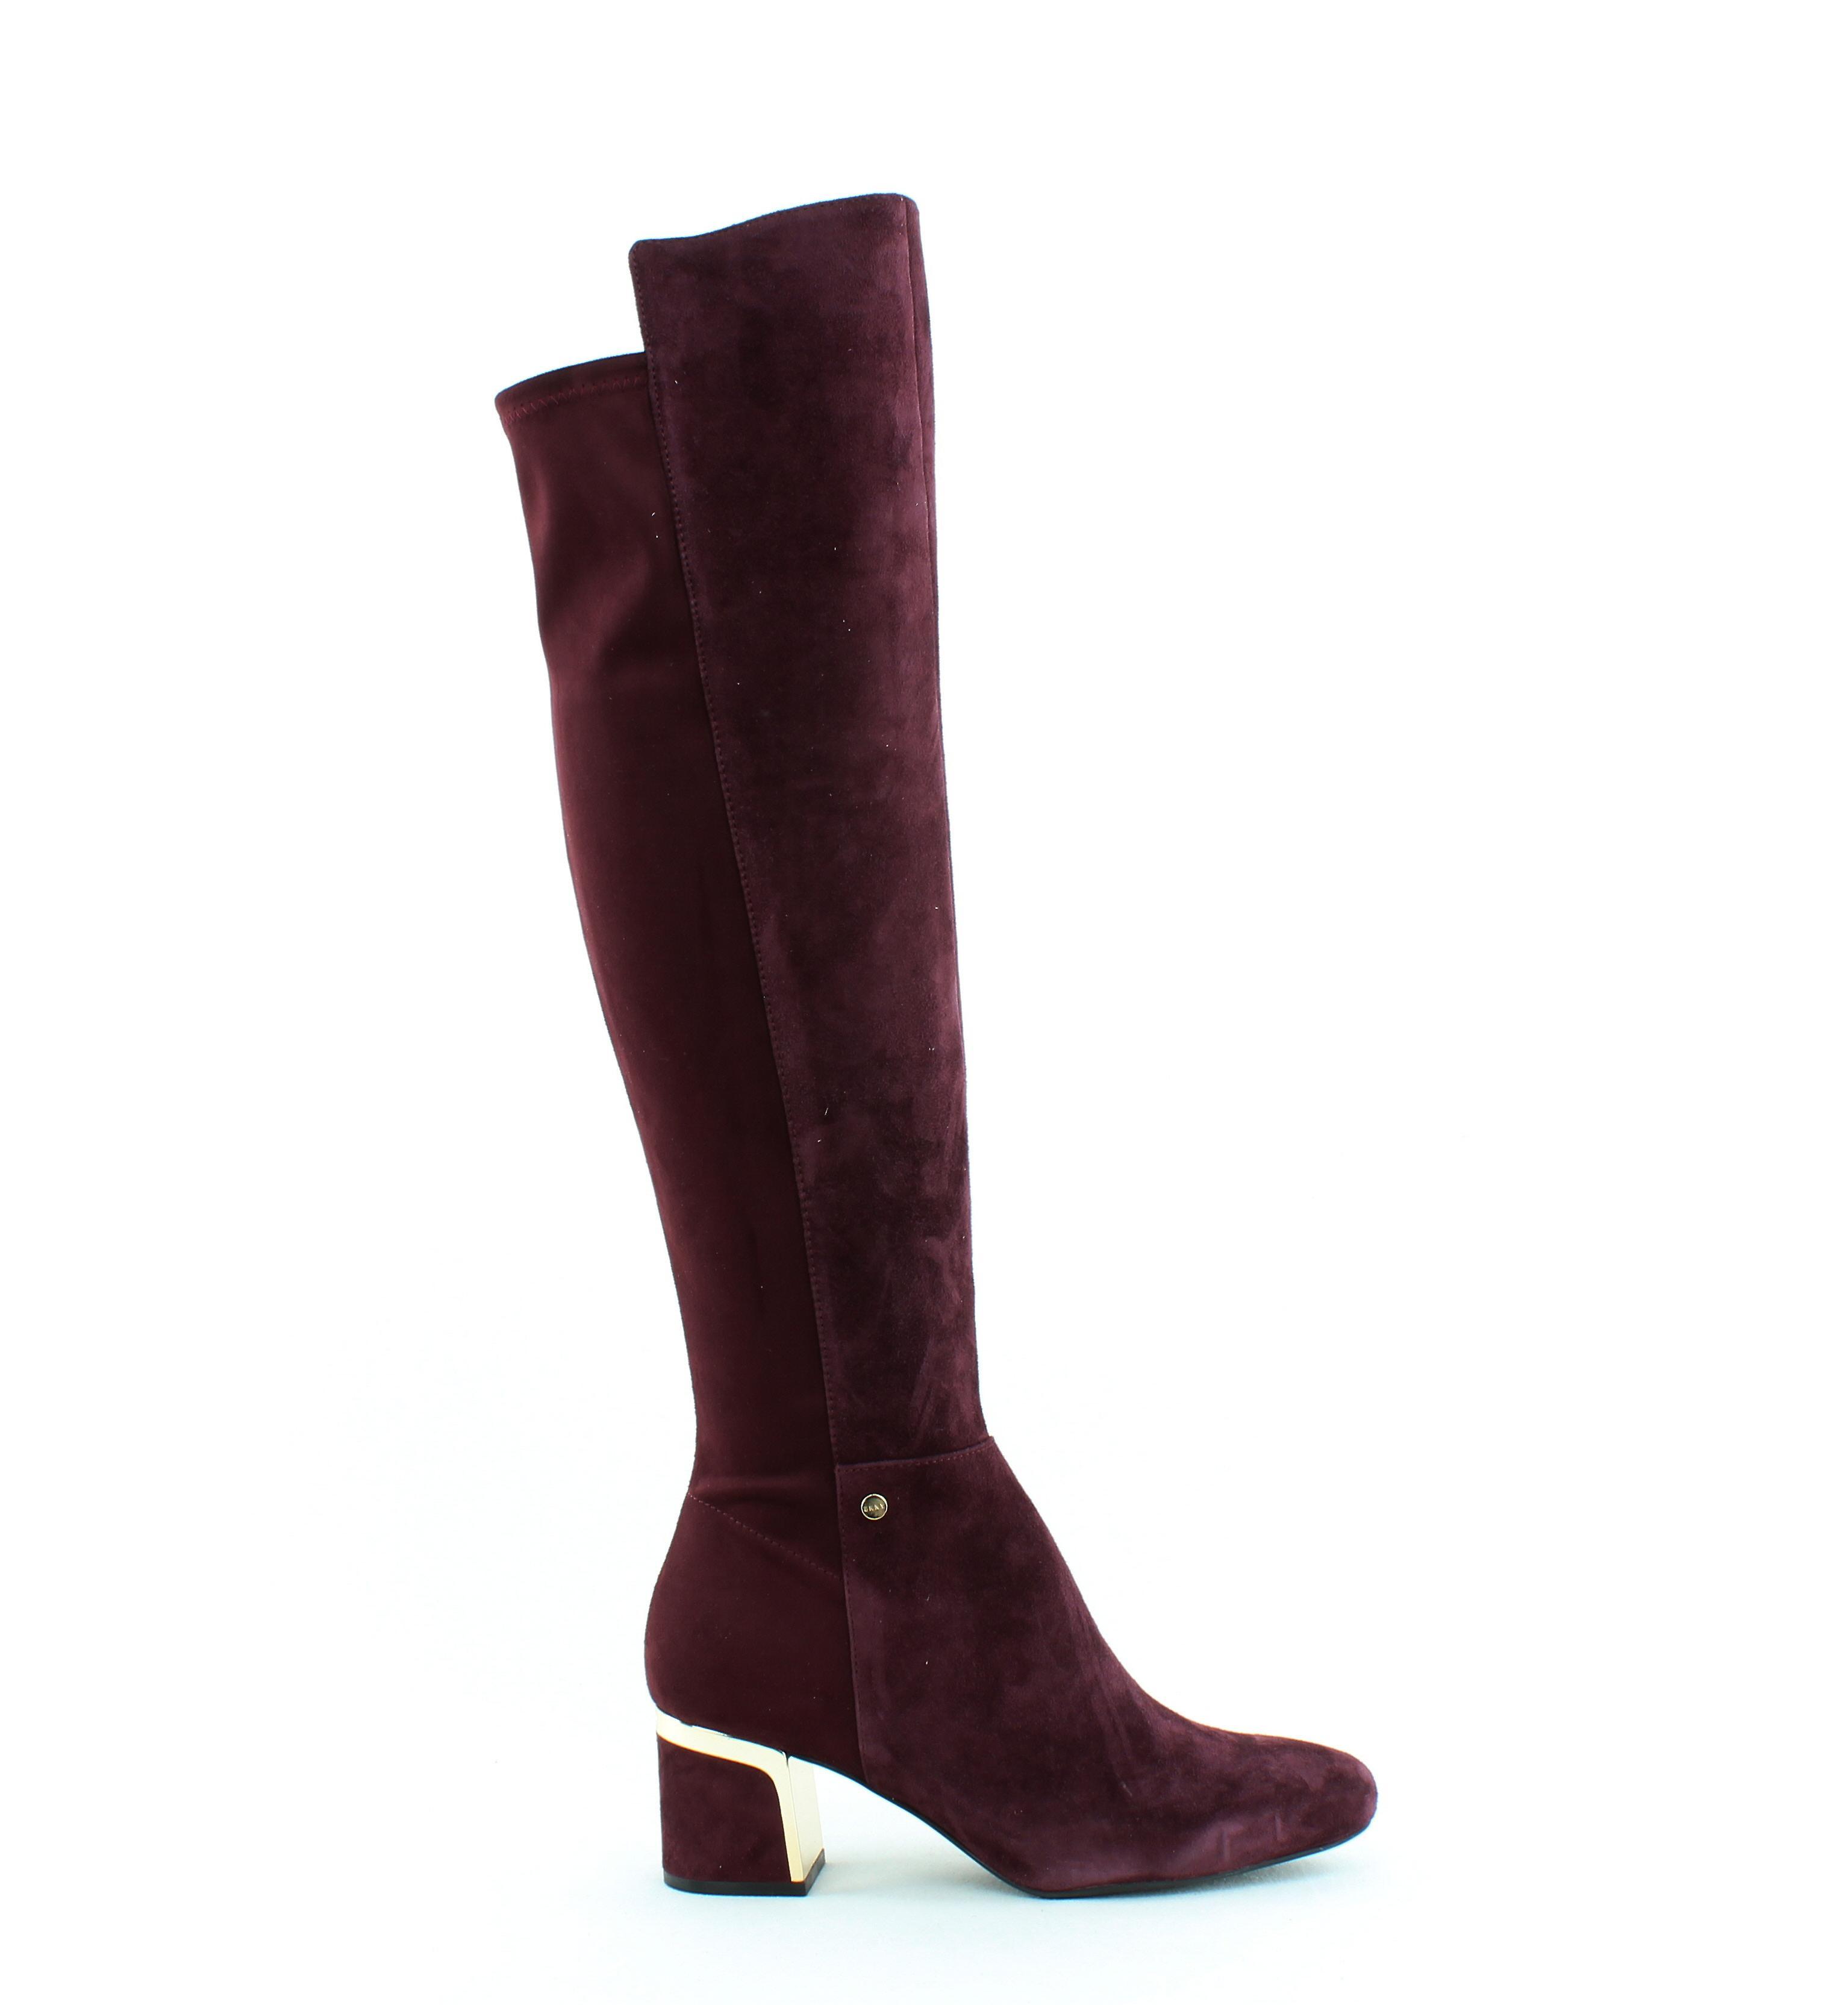 DKNY | Cora Knee High Boots